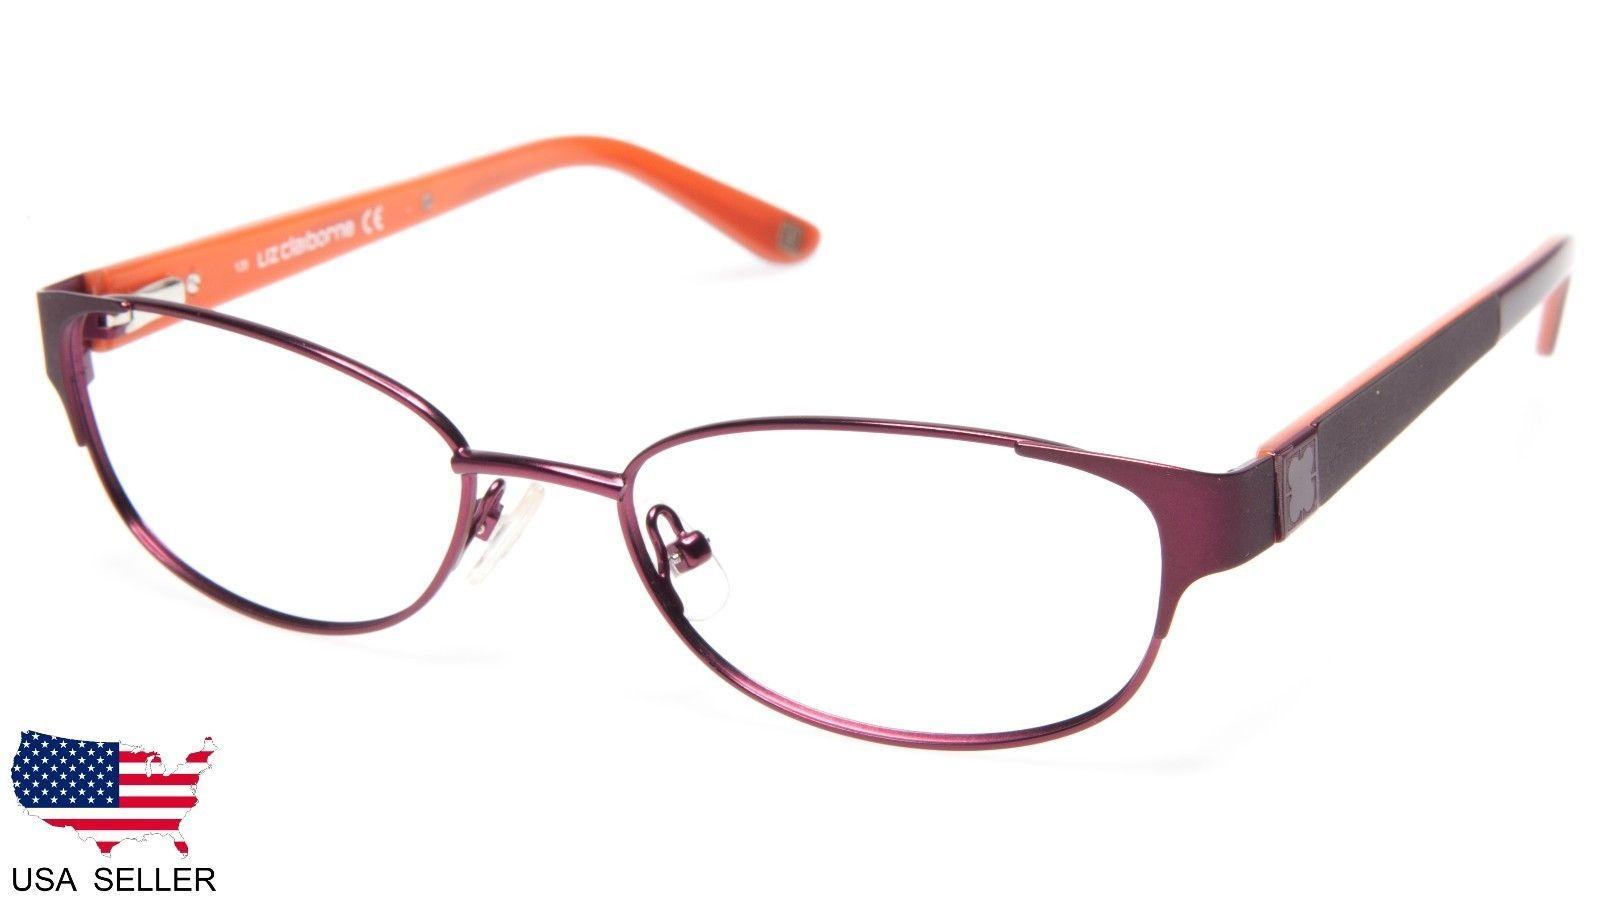 Liz Claiborne Eyeglass Frame: 25 listings